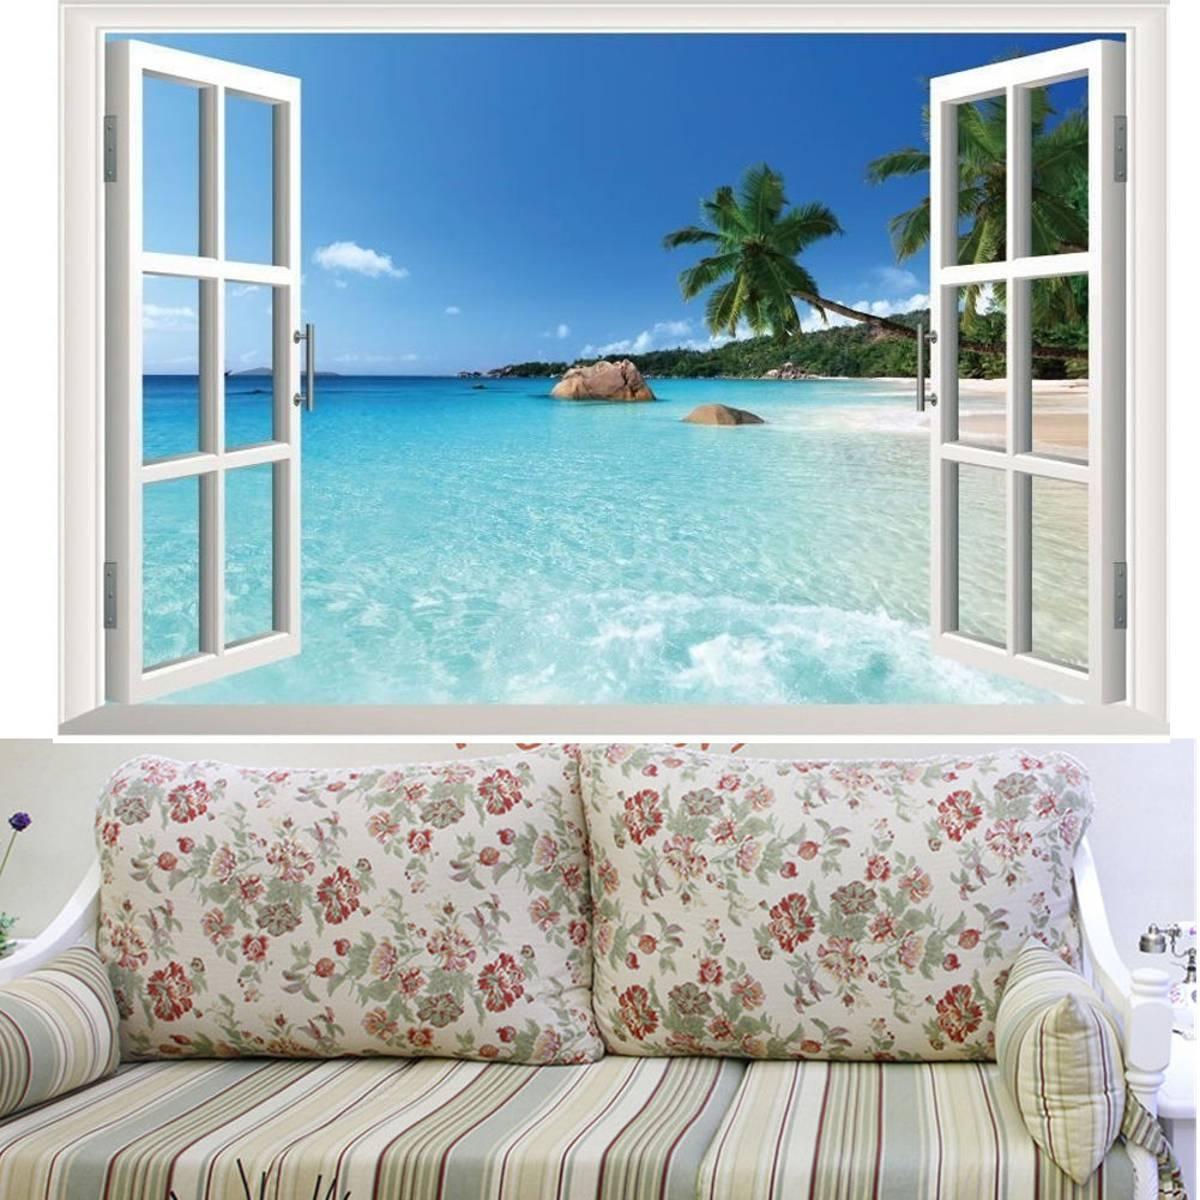 Beach Window View Scenery 3D Wall Stickers Vinyl Art Mural Decal Throughout 2018 Beach 3D Wall Art (View 19 of 20)